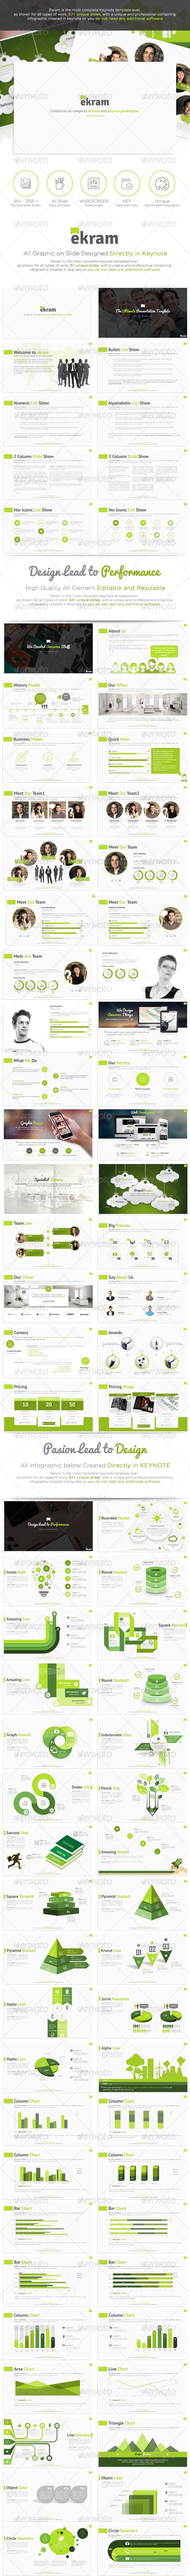 Ekram - The Most Complete Keynote Template  - Business Keynote Templates